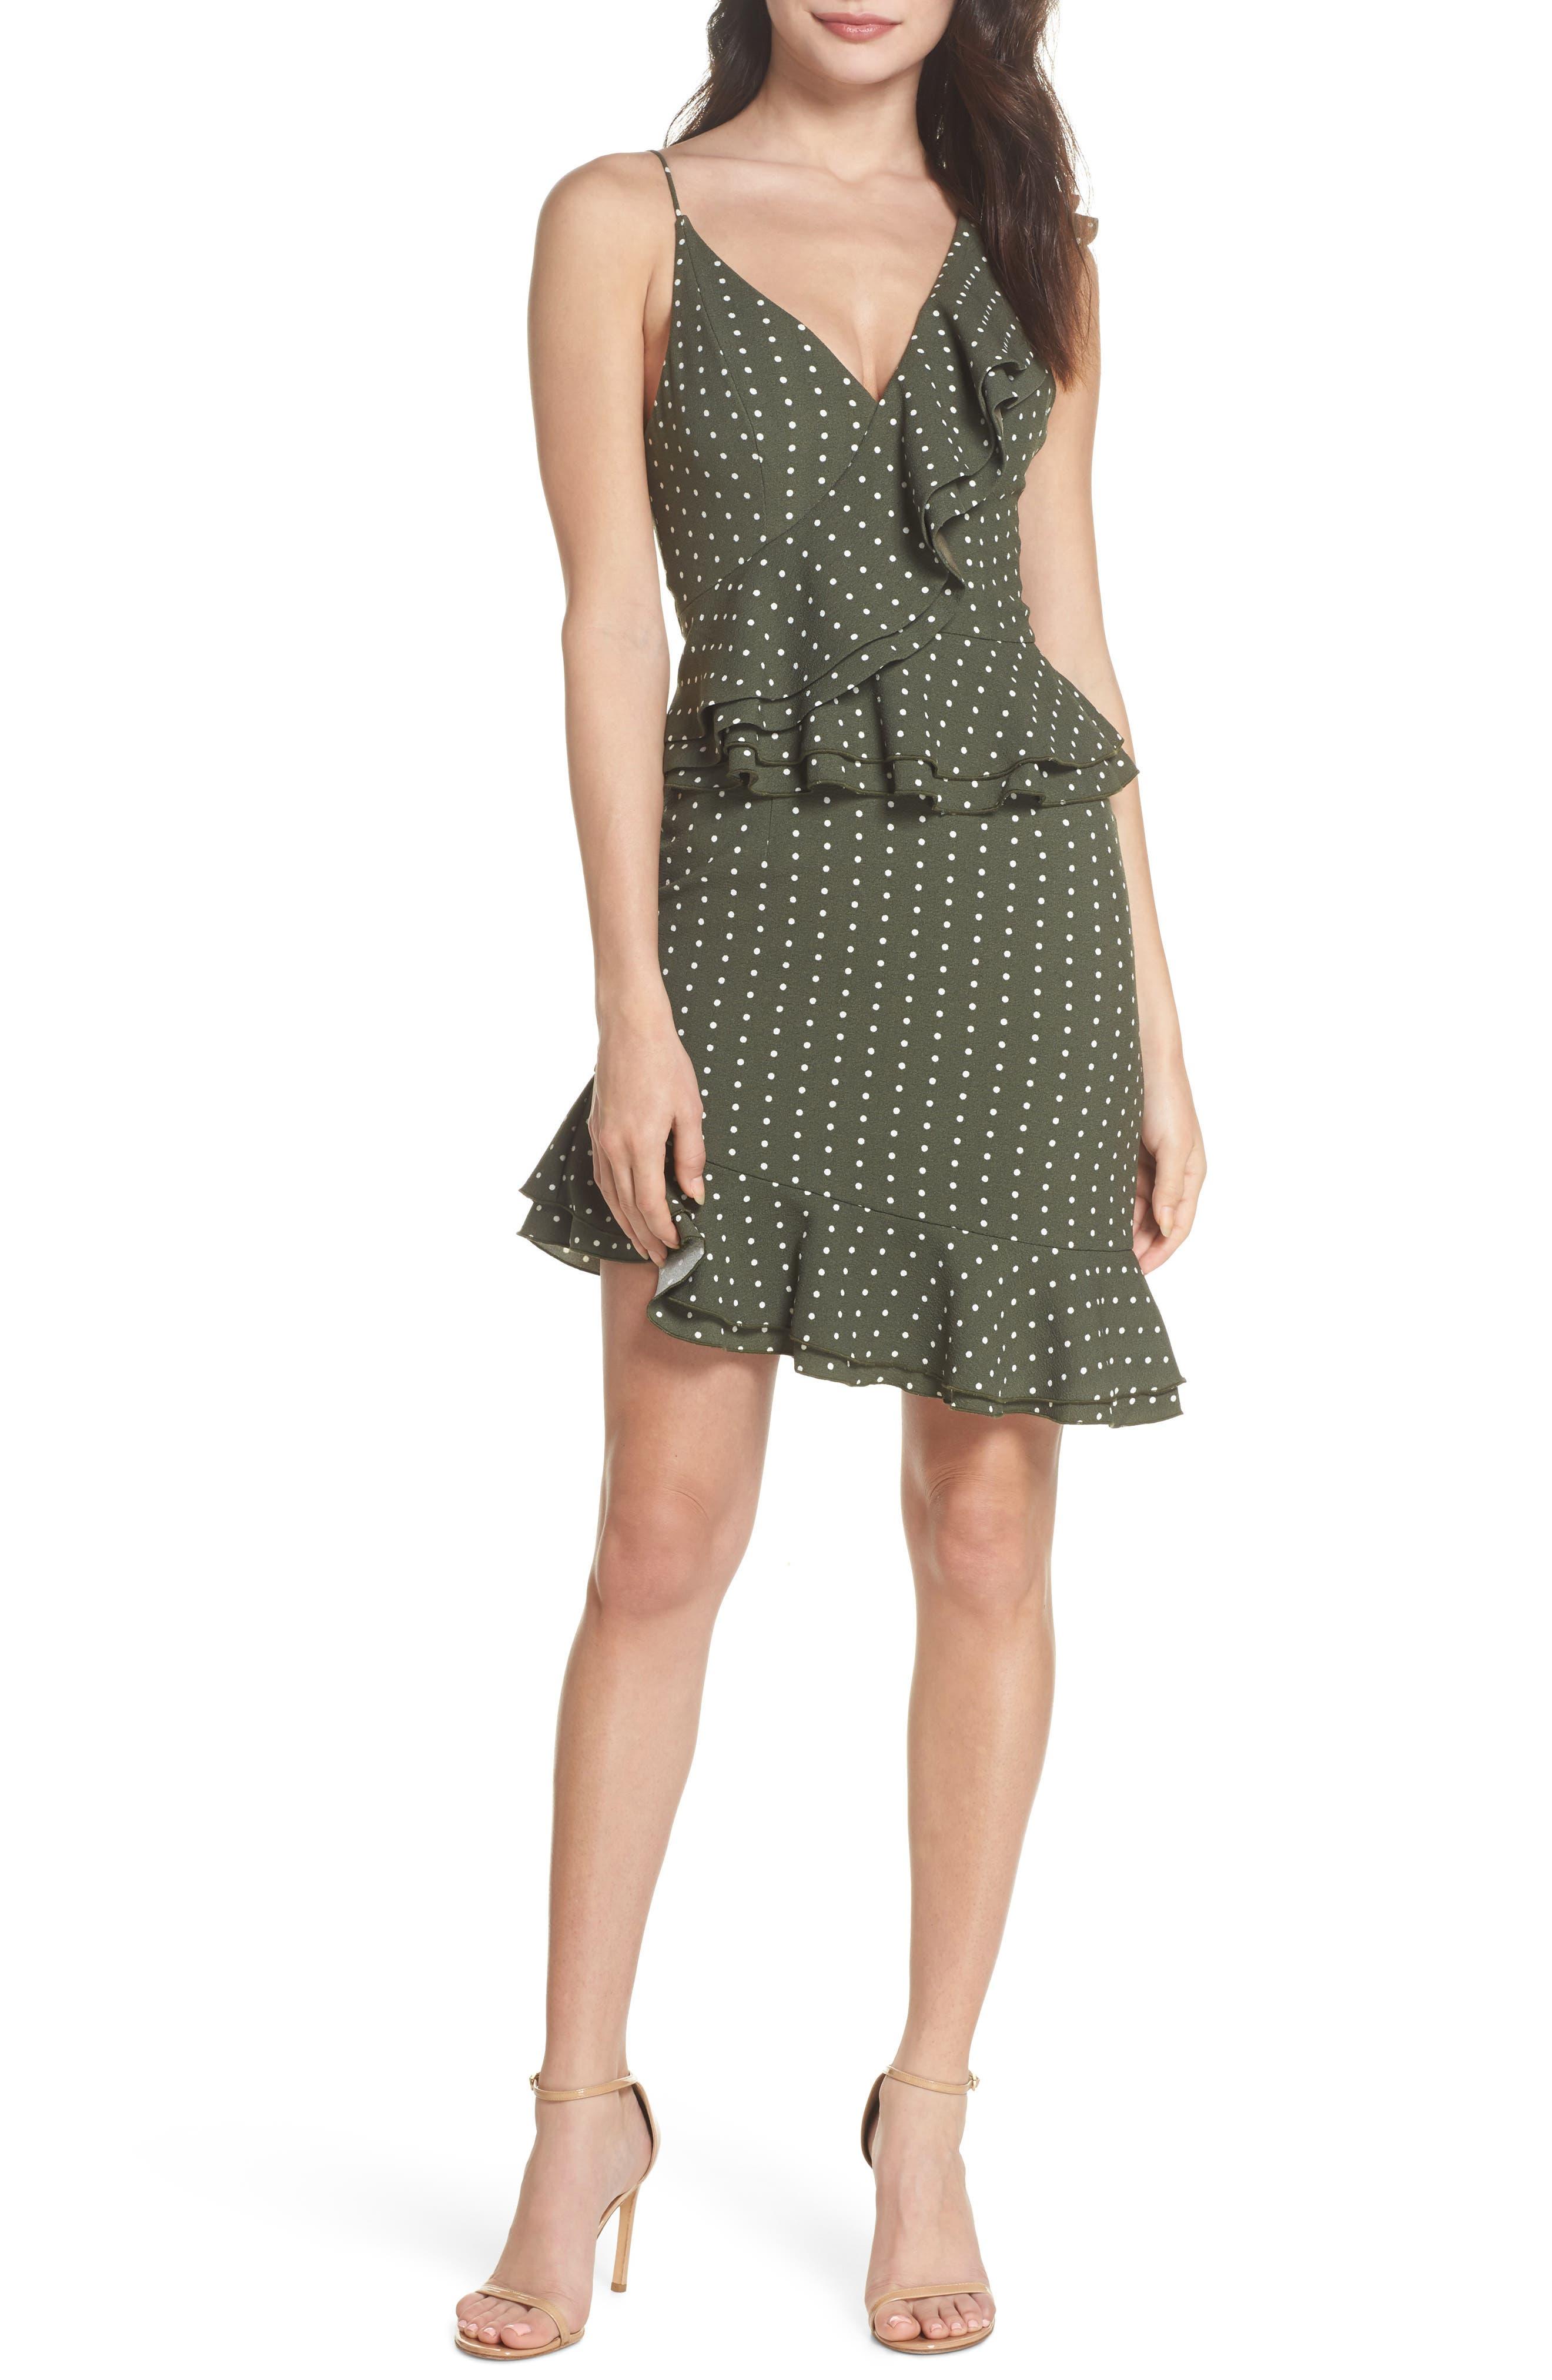 Entice Dot Ruffle Trim Dress,                         Main,                         color, Khaki W Ivory Spot